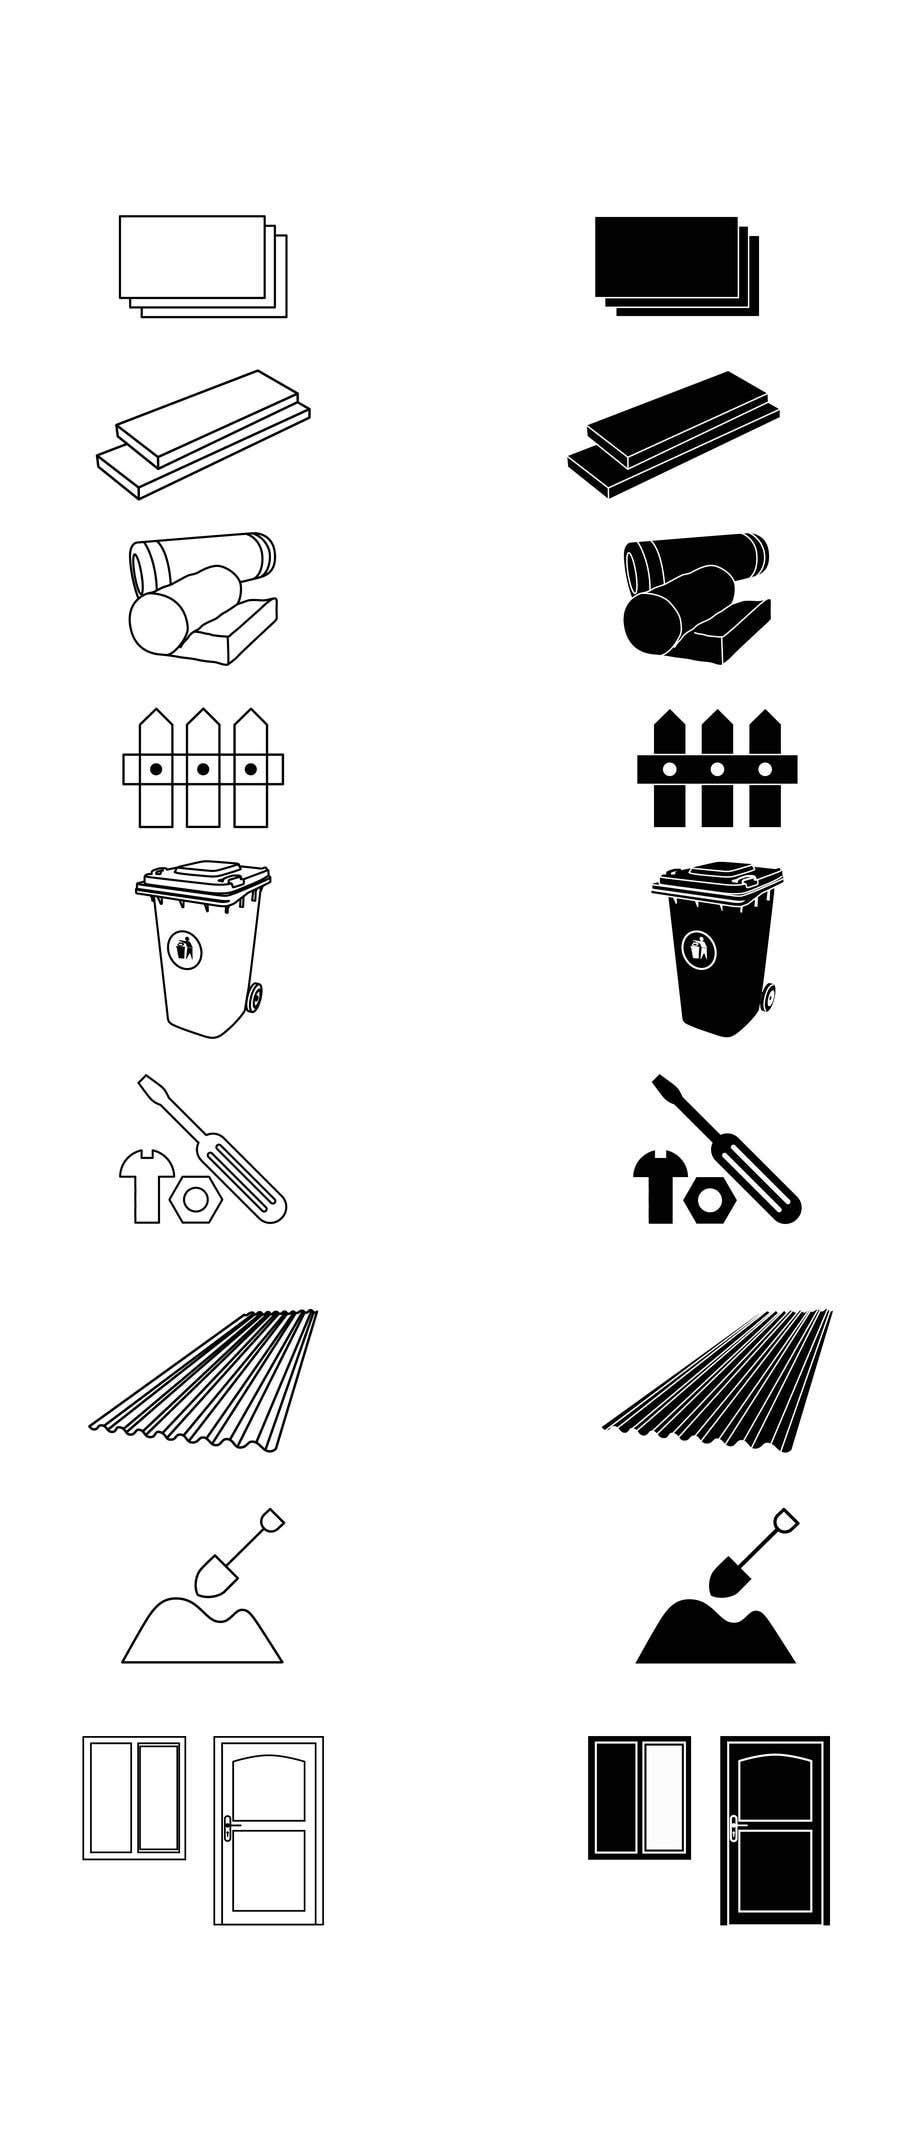 Penyertaan Peraduan #                                        21                                      untuk                                         Create 9 x Custom SVG Icons